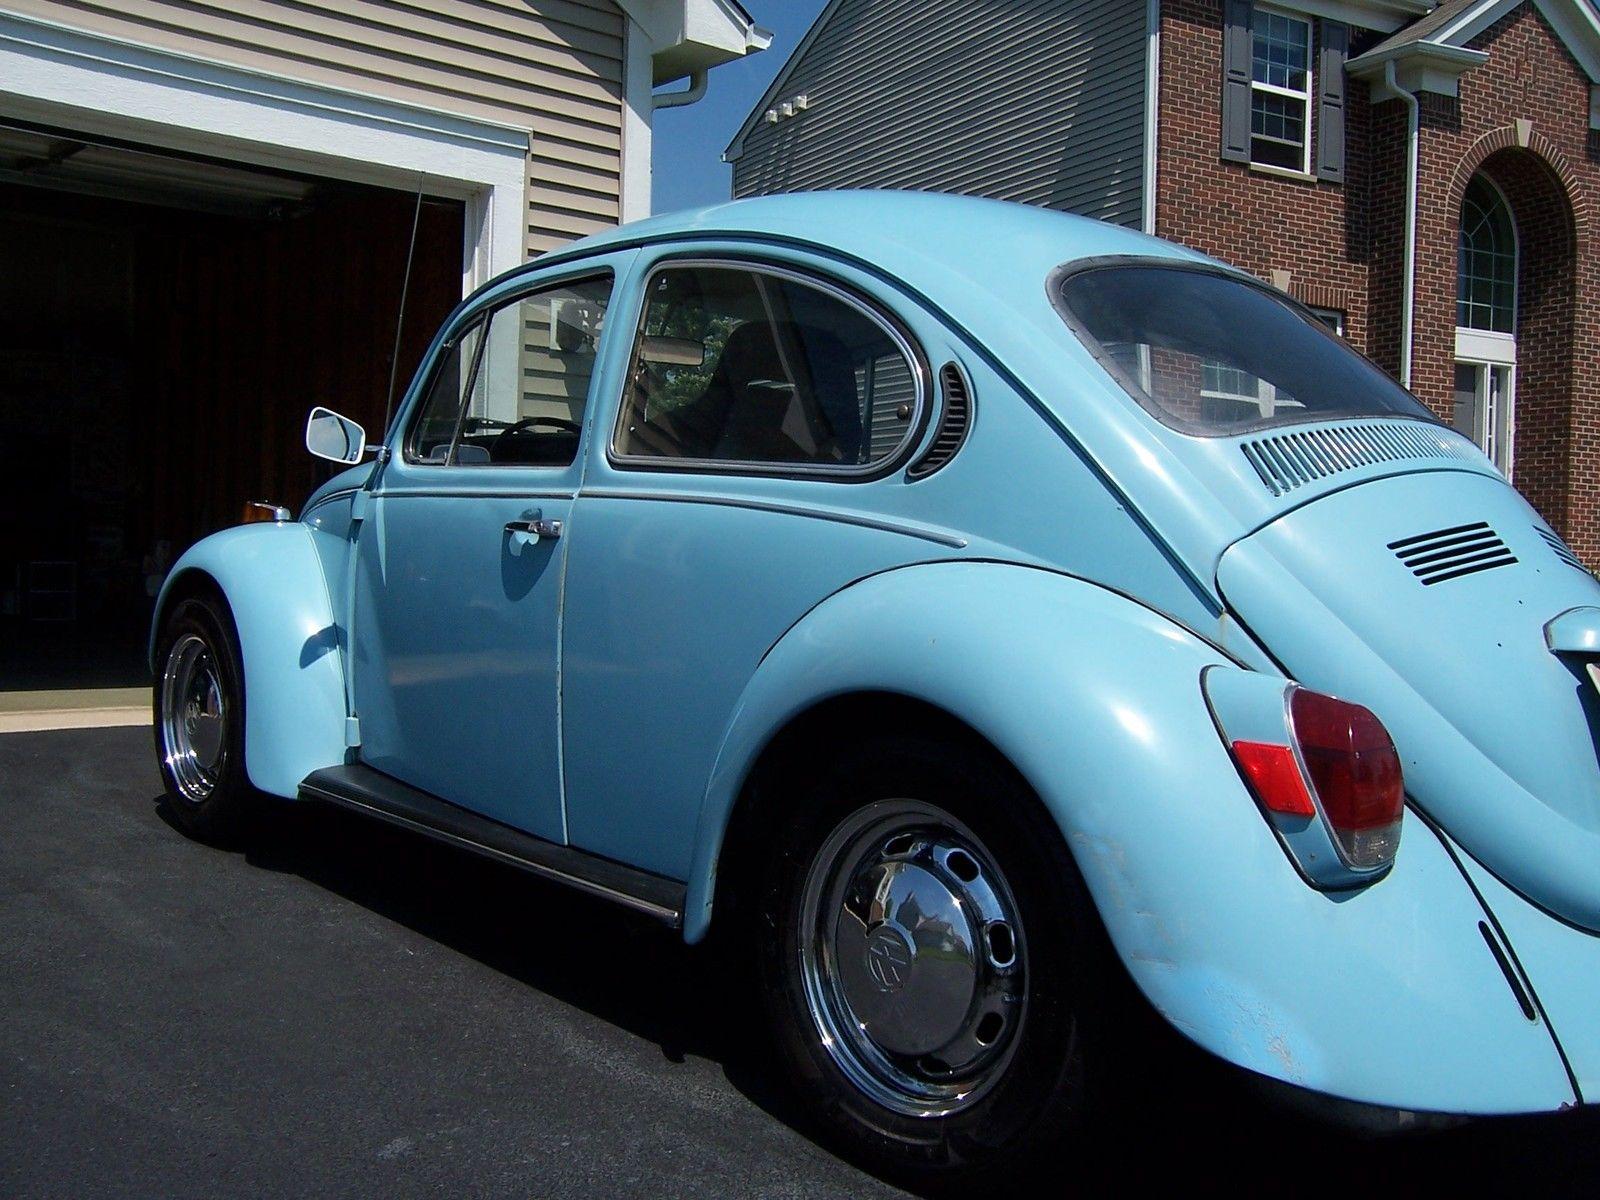 1971 Beetle With A Subaru Ej20 Engine Swap Depot 2000 Vw Wiring Harness